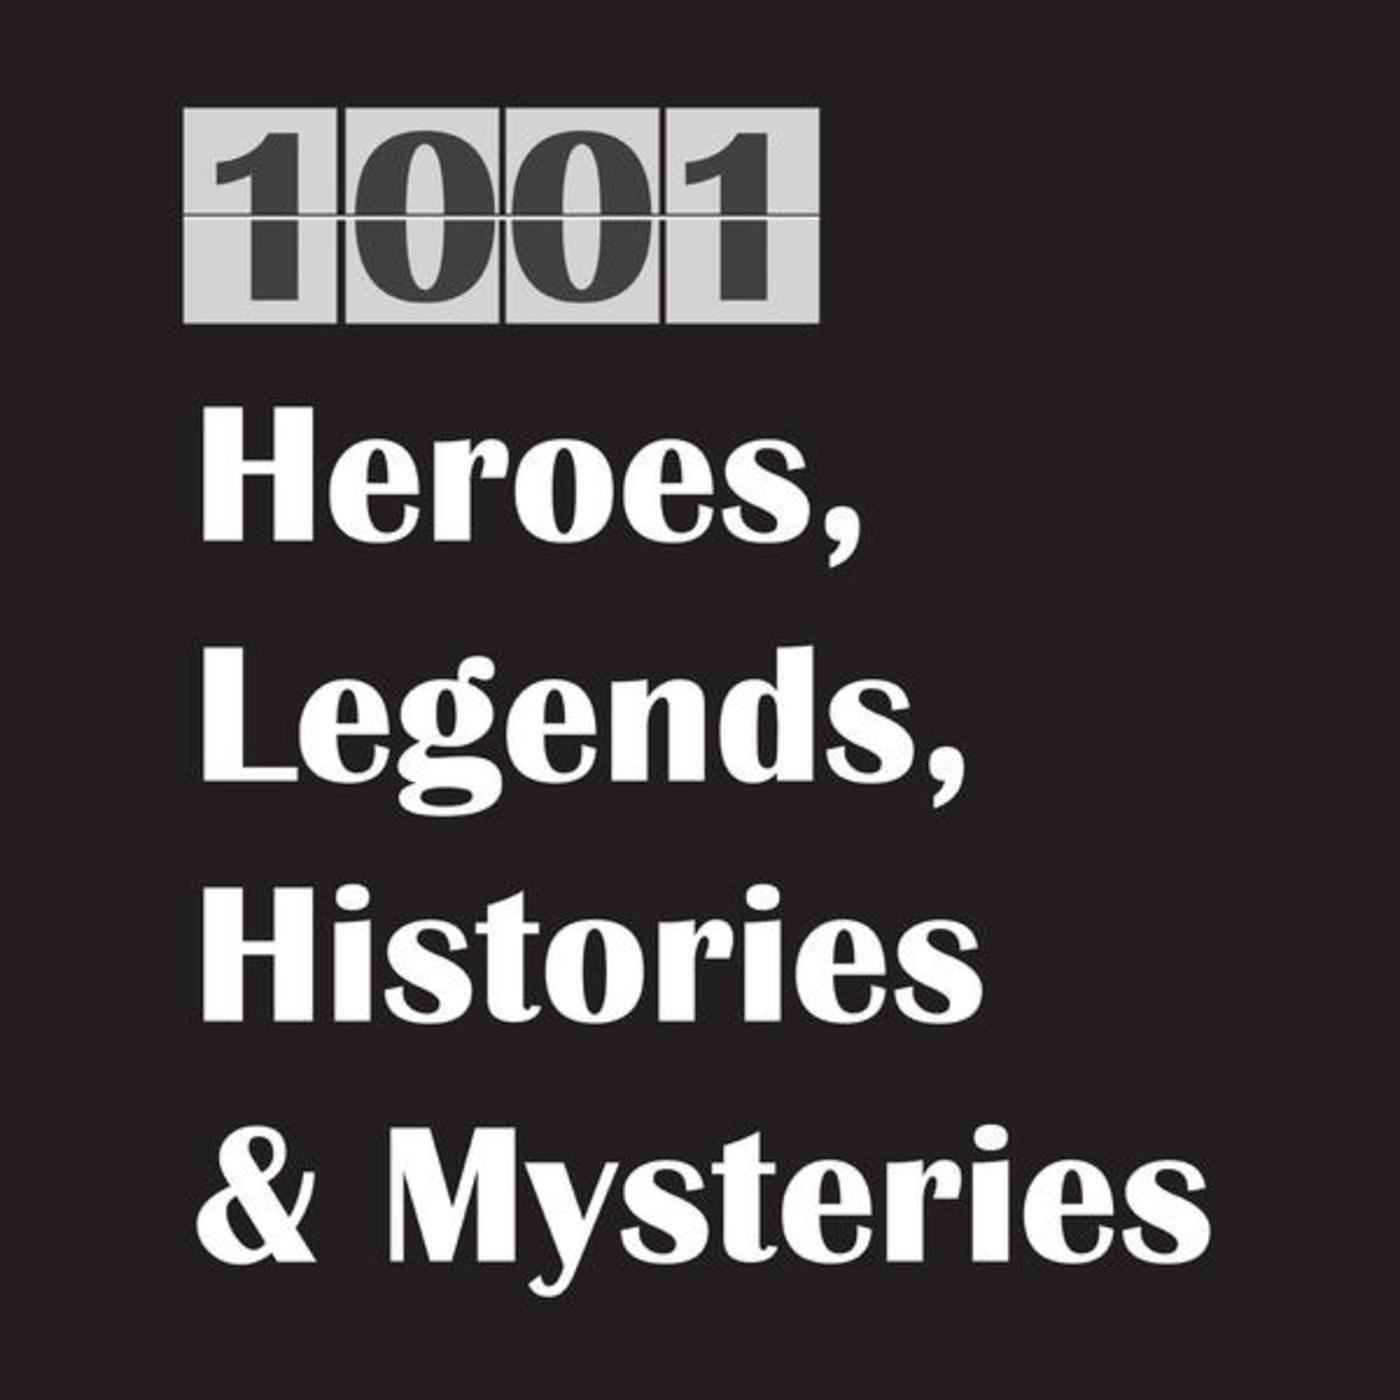 1001 Heroes, Legends, Histories & Mysteries